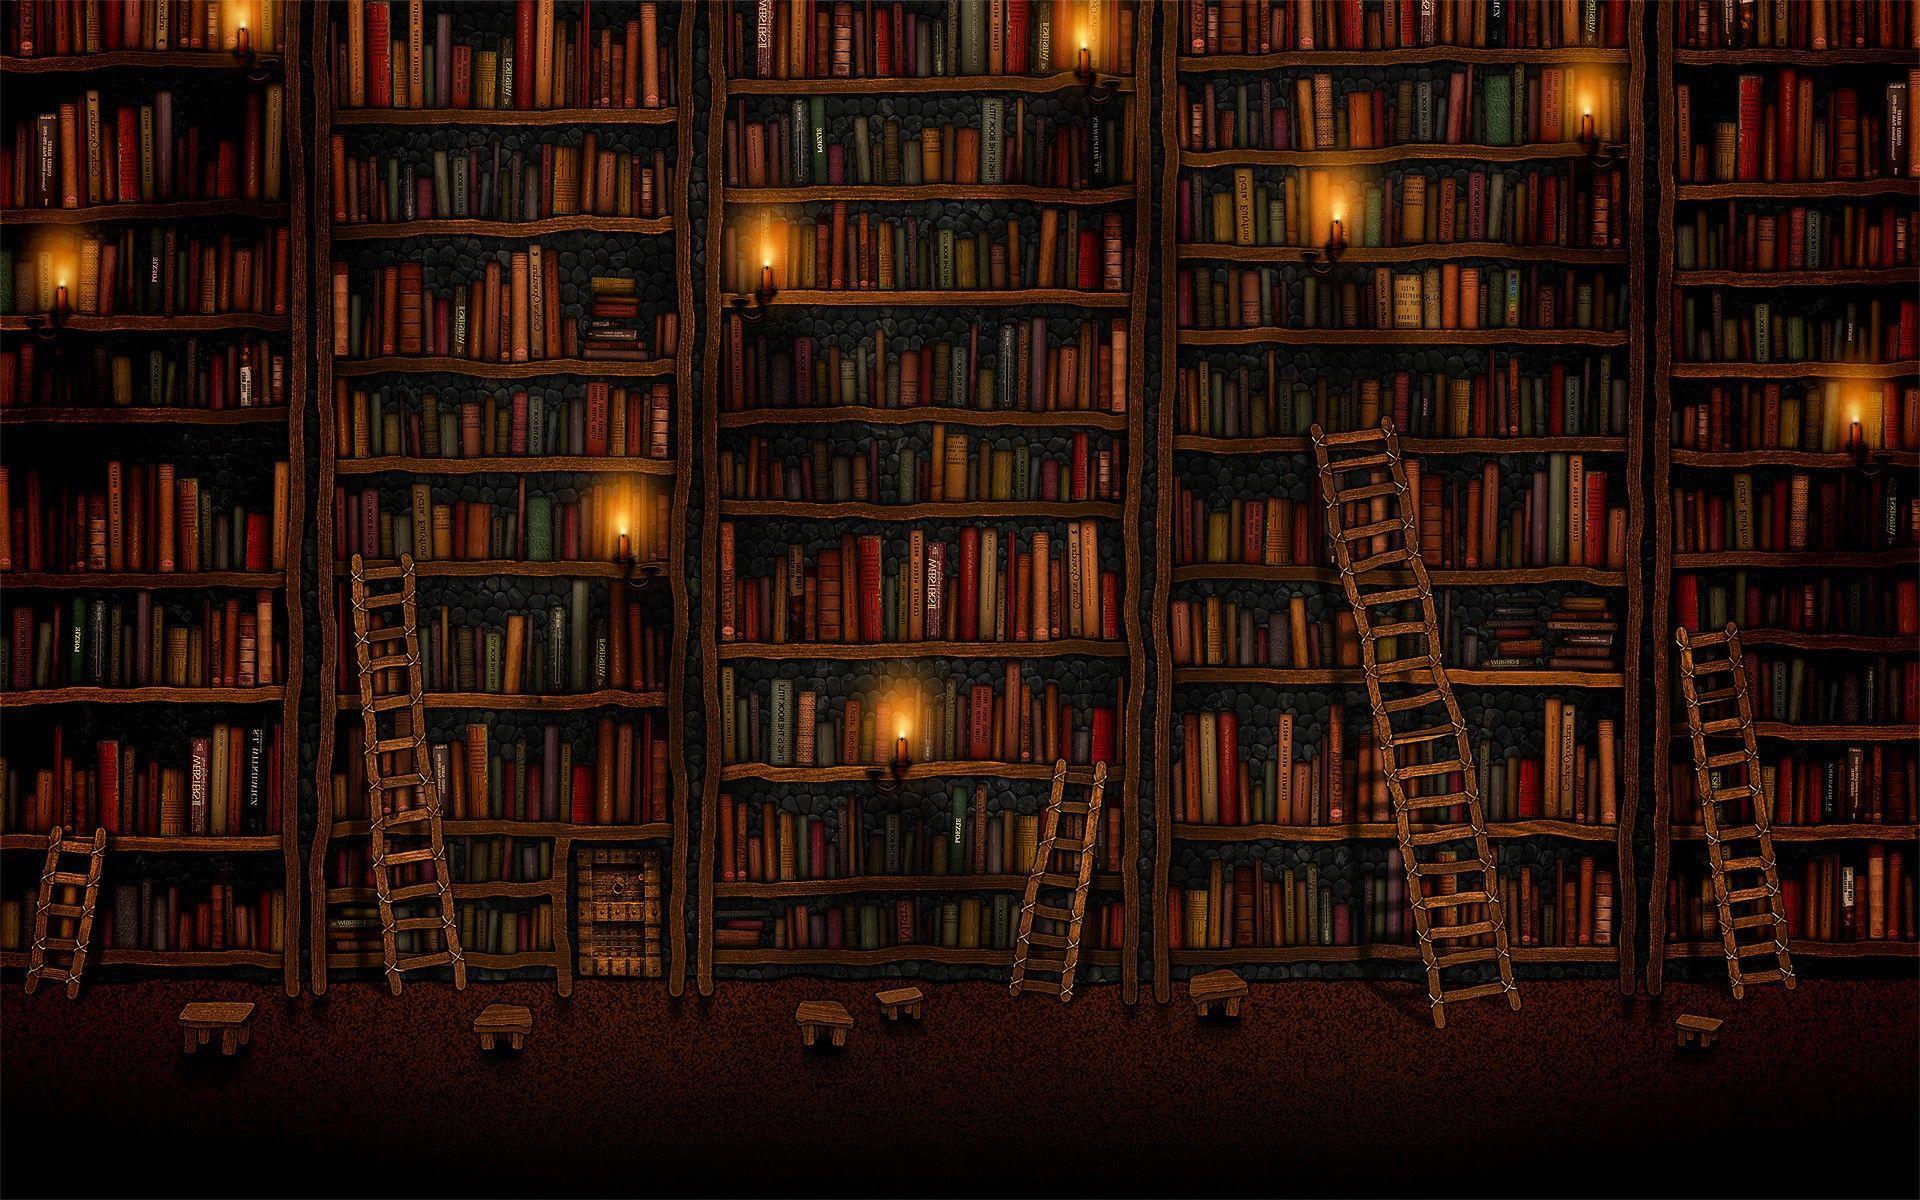 Bookshelf Wallpapers Top Free Bookshelf Backgrounds Wallpaperaccess